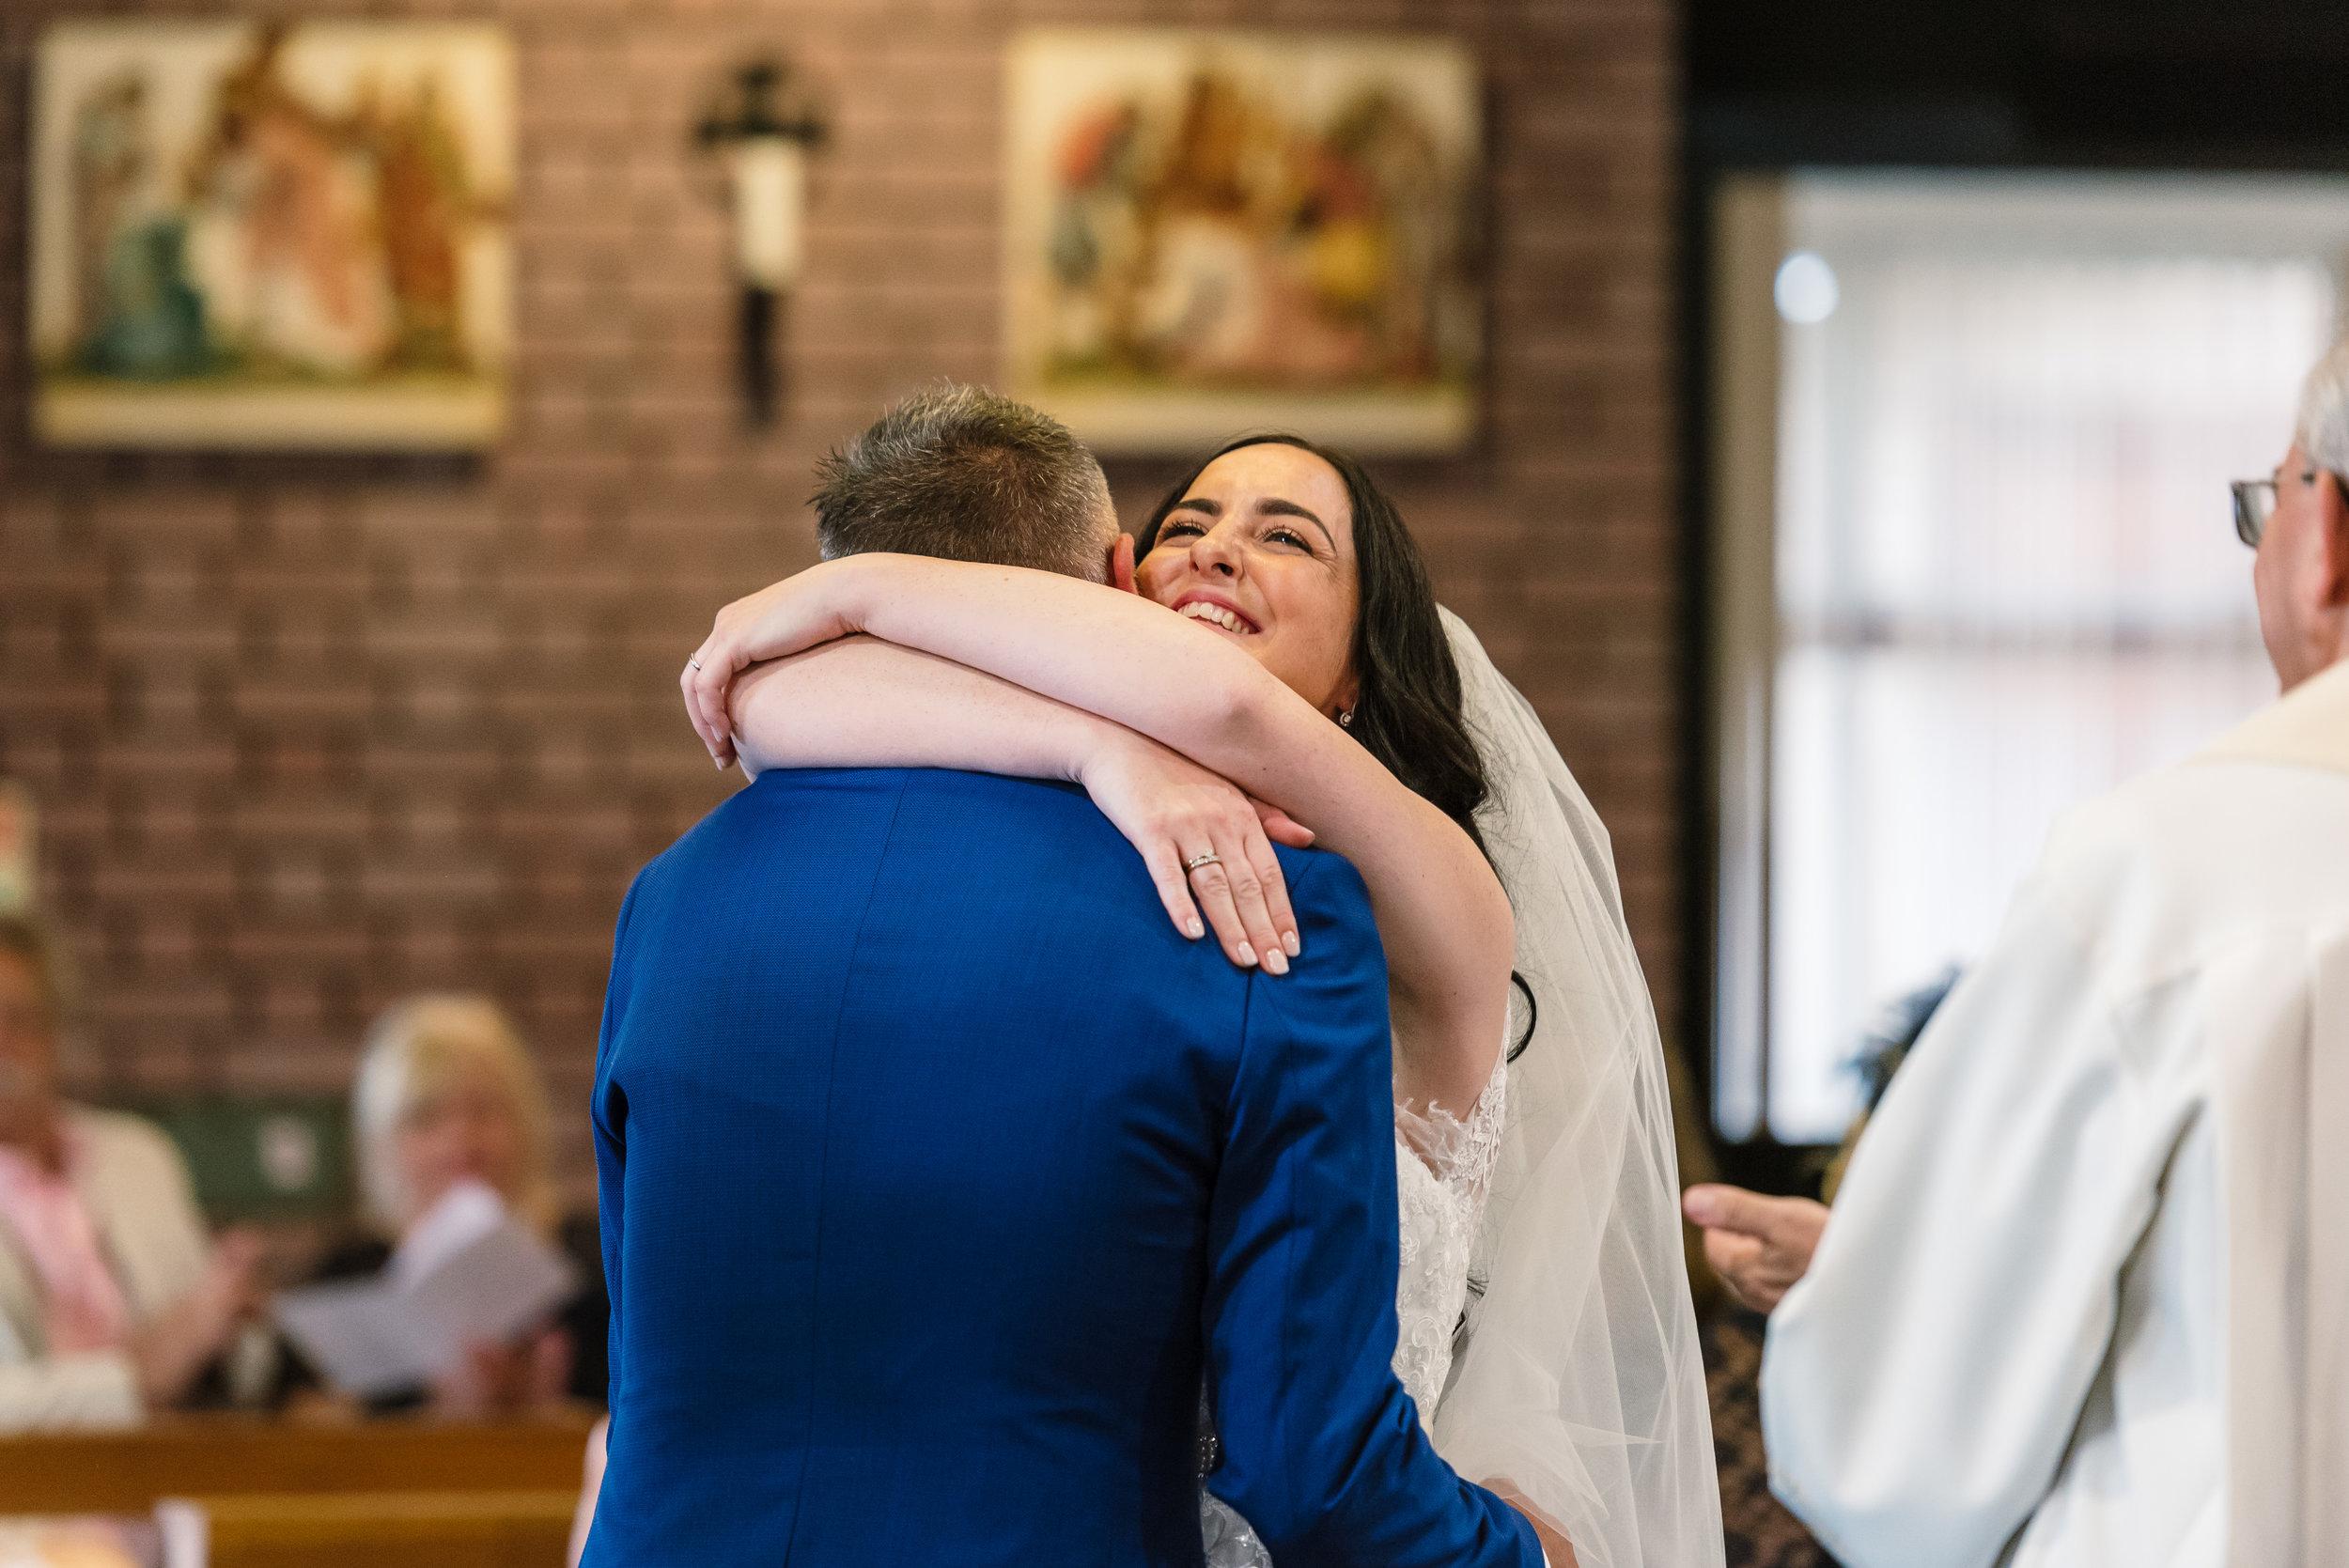 Sarah-Fishlock-Photography : Hampshire-wedding-photographer-hampshire : fleet-wedding-photographer-fleet : Meade-Hall-Wedding-Photographer : Meade-Hall-Wedding-Photos-515.jpg